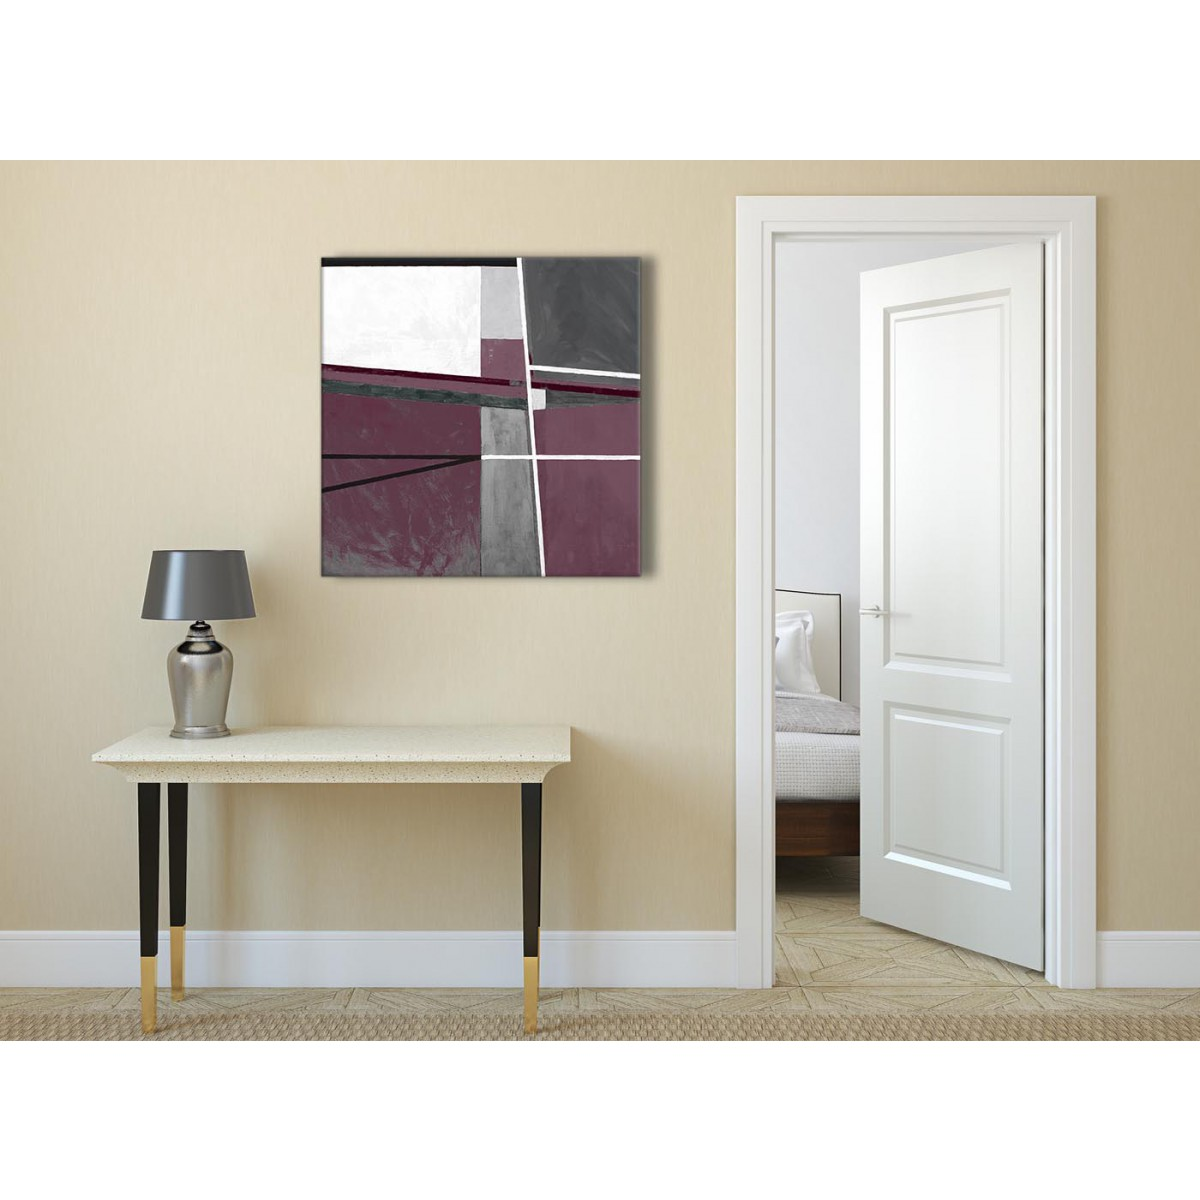 Plum Purple Grey Painting Kitchen Canvas Pictures: Plum Purple Grey Painting Abstract Office Canvas Pictures